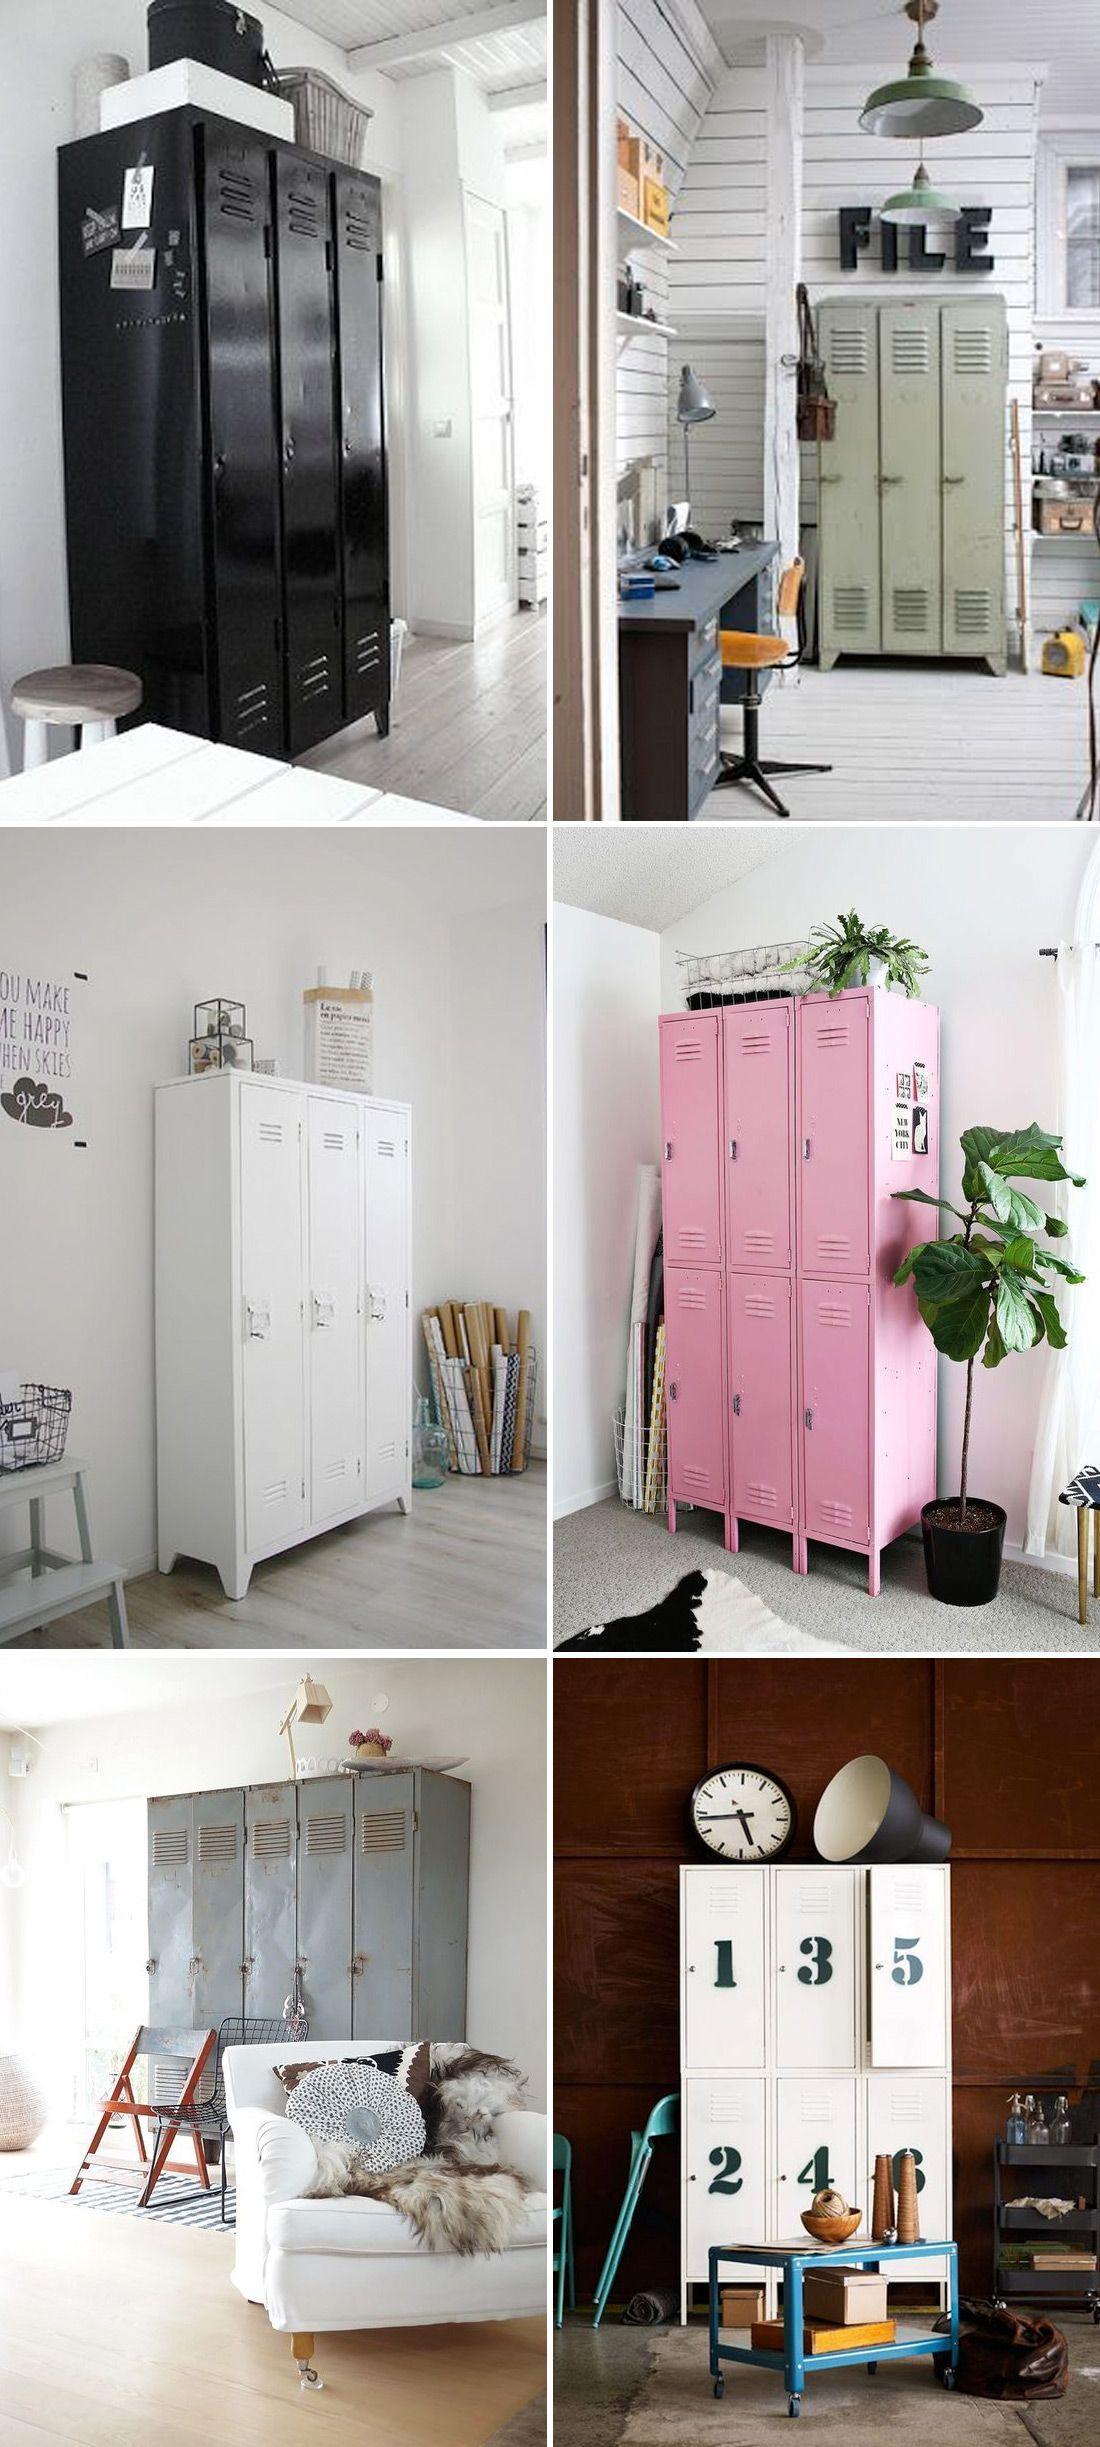 10 Locker Room Bedroom Ideas Most Stylish as well as